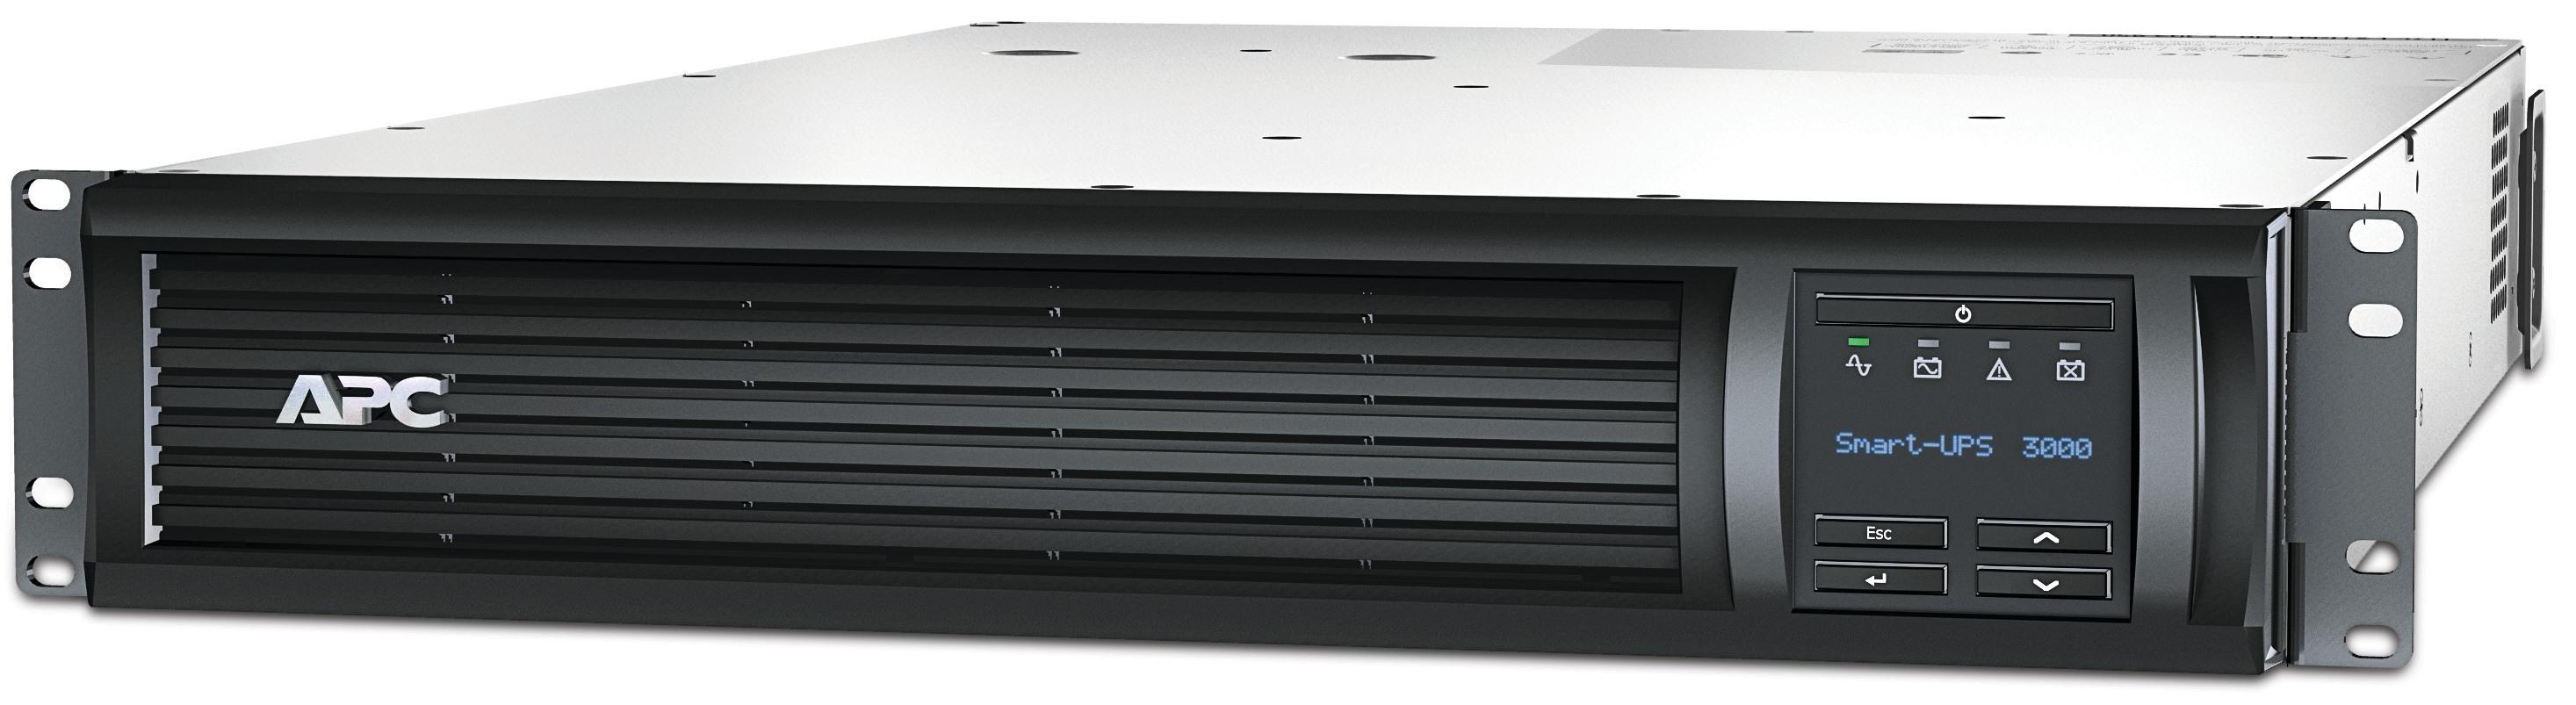 APC-by-Schneider-Electric-Smart-UPS-SMT3000RMI2U